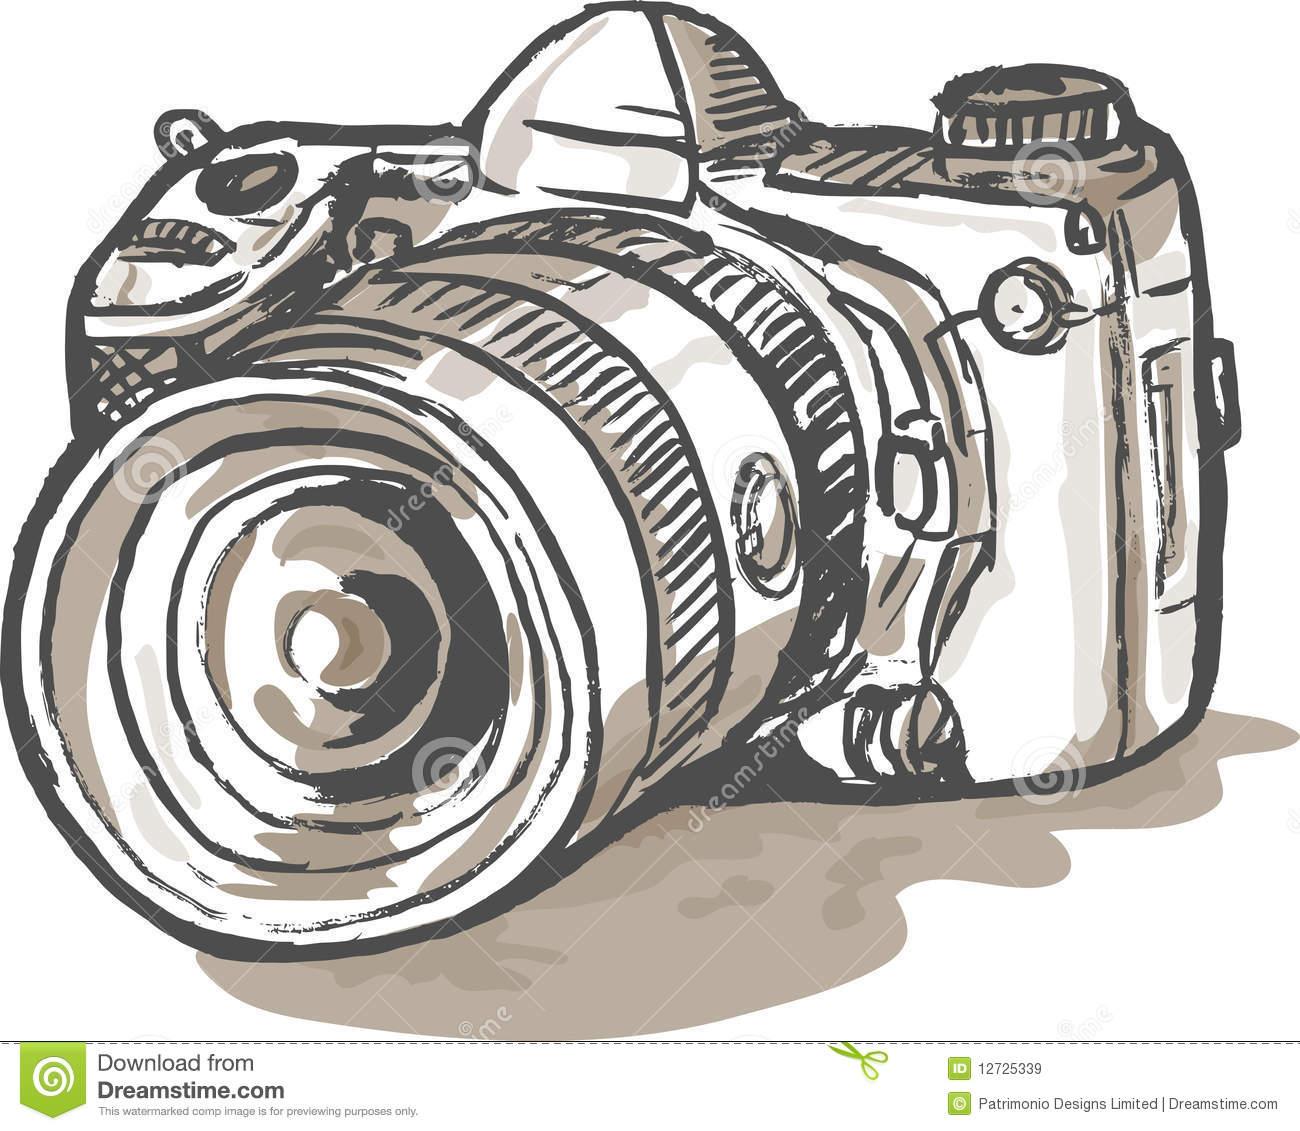 free clipart slr camera - photo #35